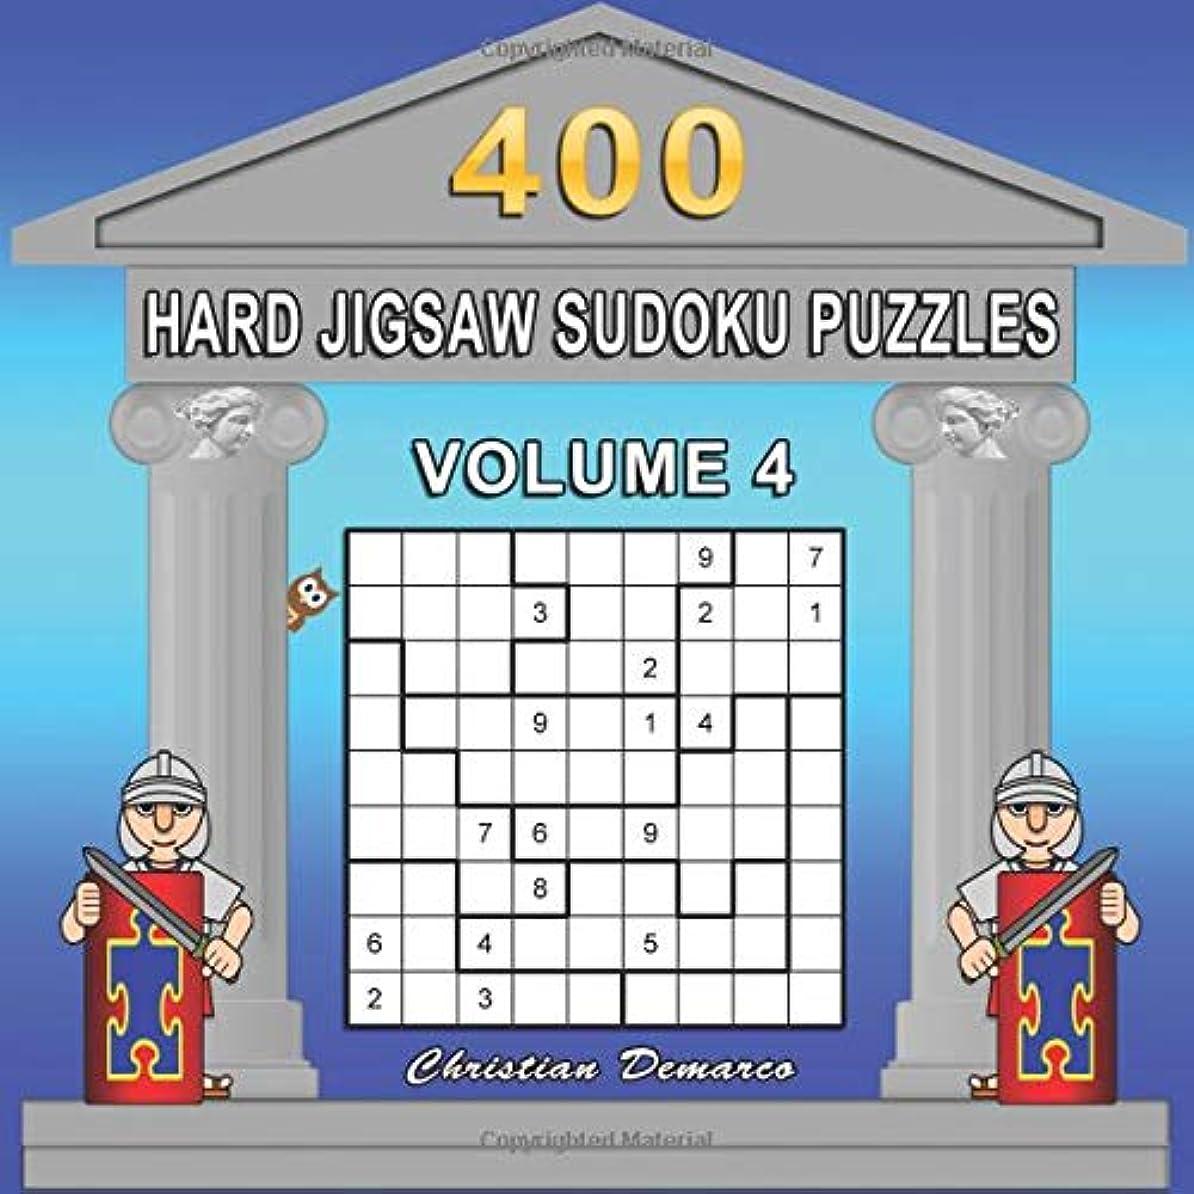 限界凍結400 Hard Jigsaw Sudoku Puzzles Volume 4: Extra Large Book Layout - Only 4 Puzzles per Page